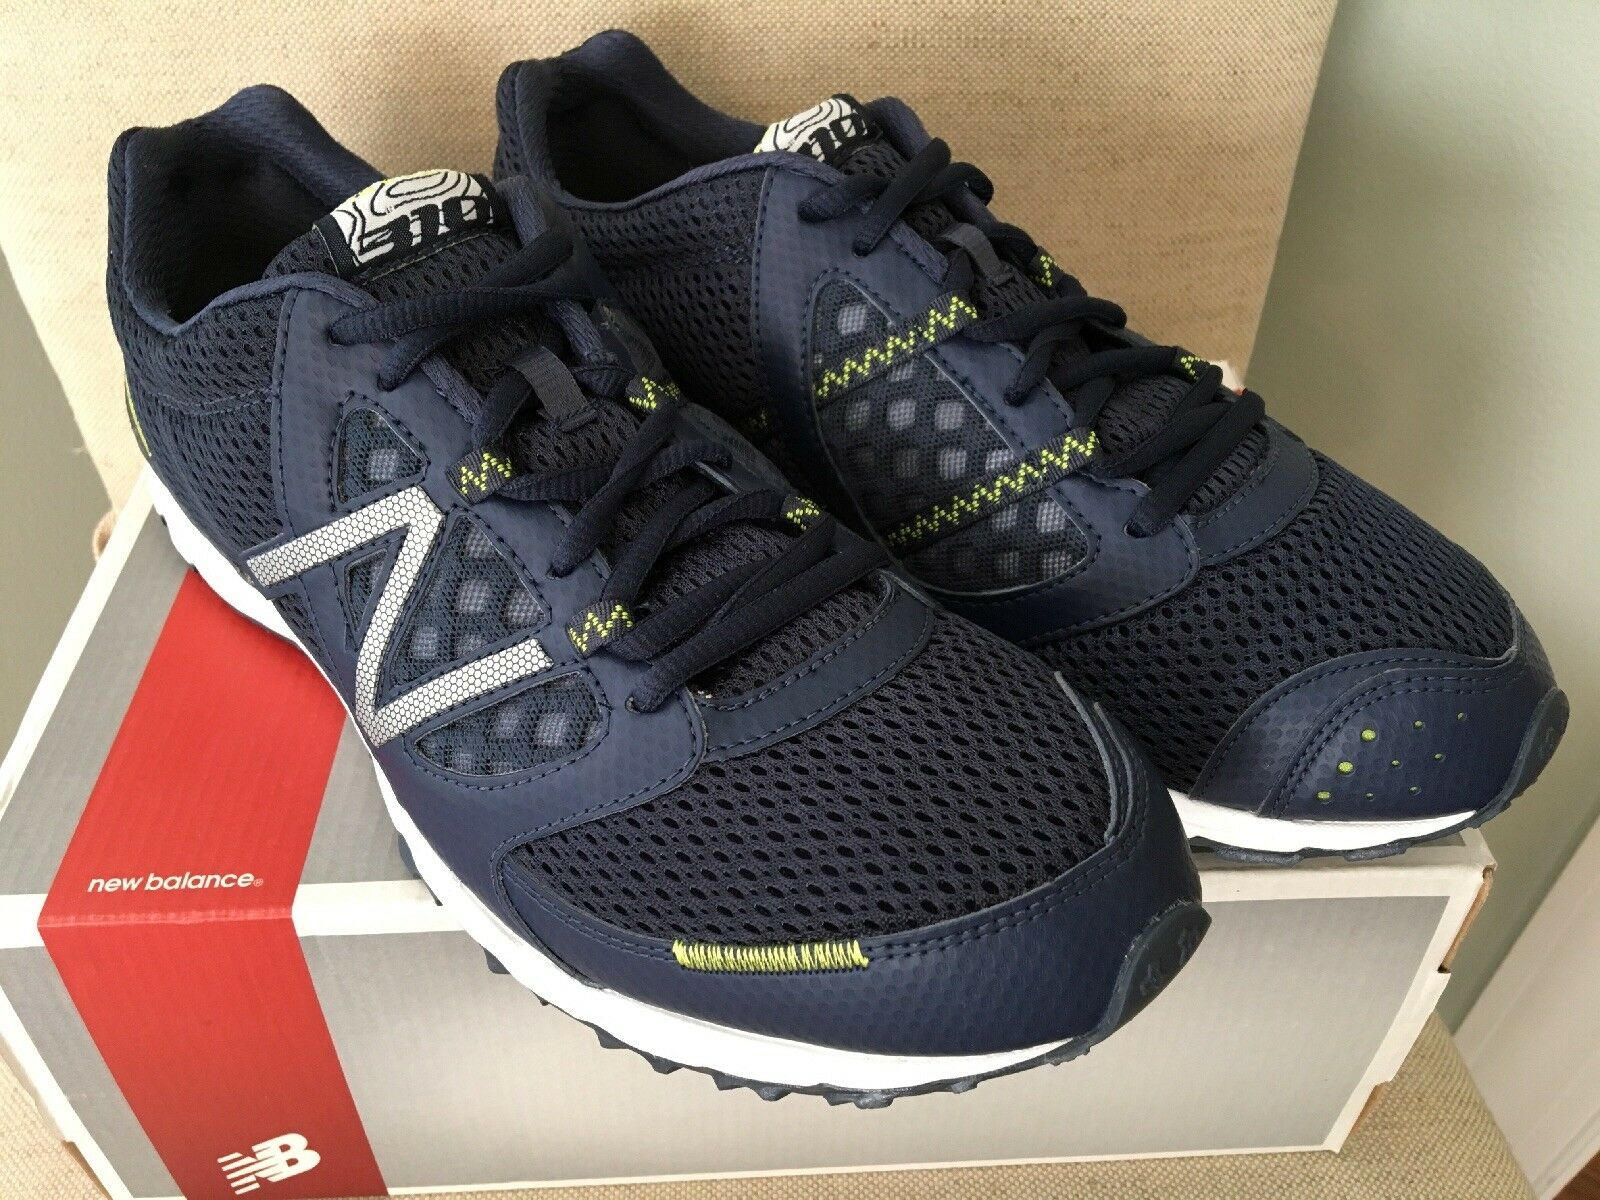 photos officielles 7f752 4c5a2 New Balance 310 310 310 - Brand New Size 10.5 65e1c4 - tyxis ...